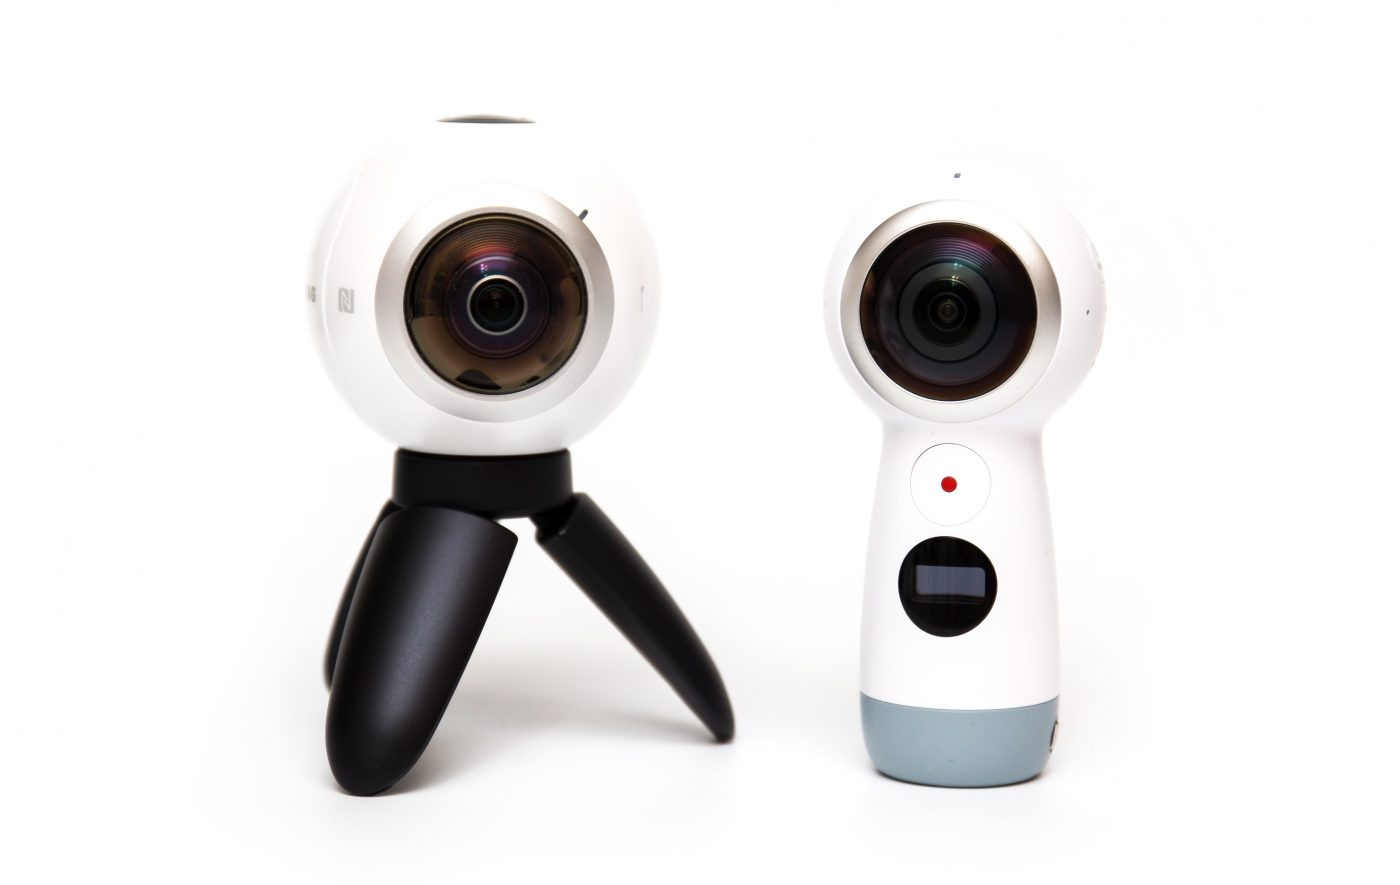 Gear 360 (2017) 最值得購買的 360 全景相機 (1) 新舊版規格比較 @3C 達人廖阿輝